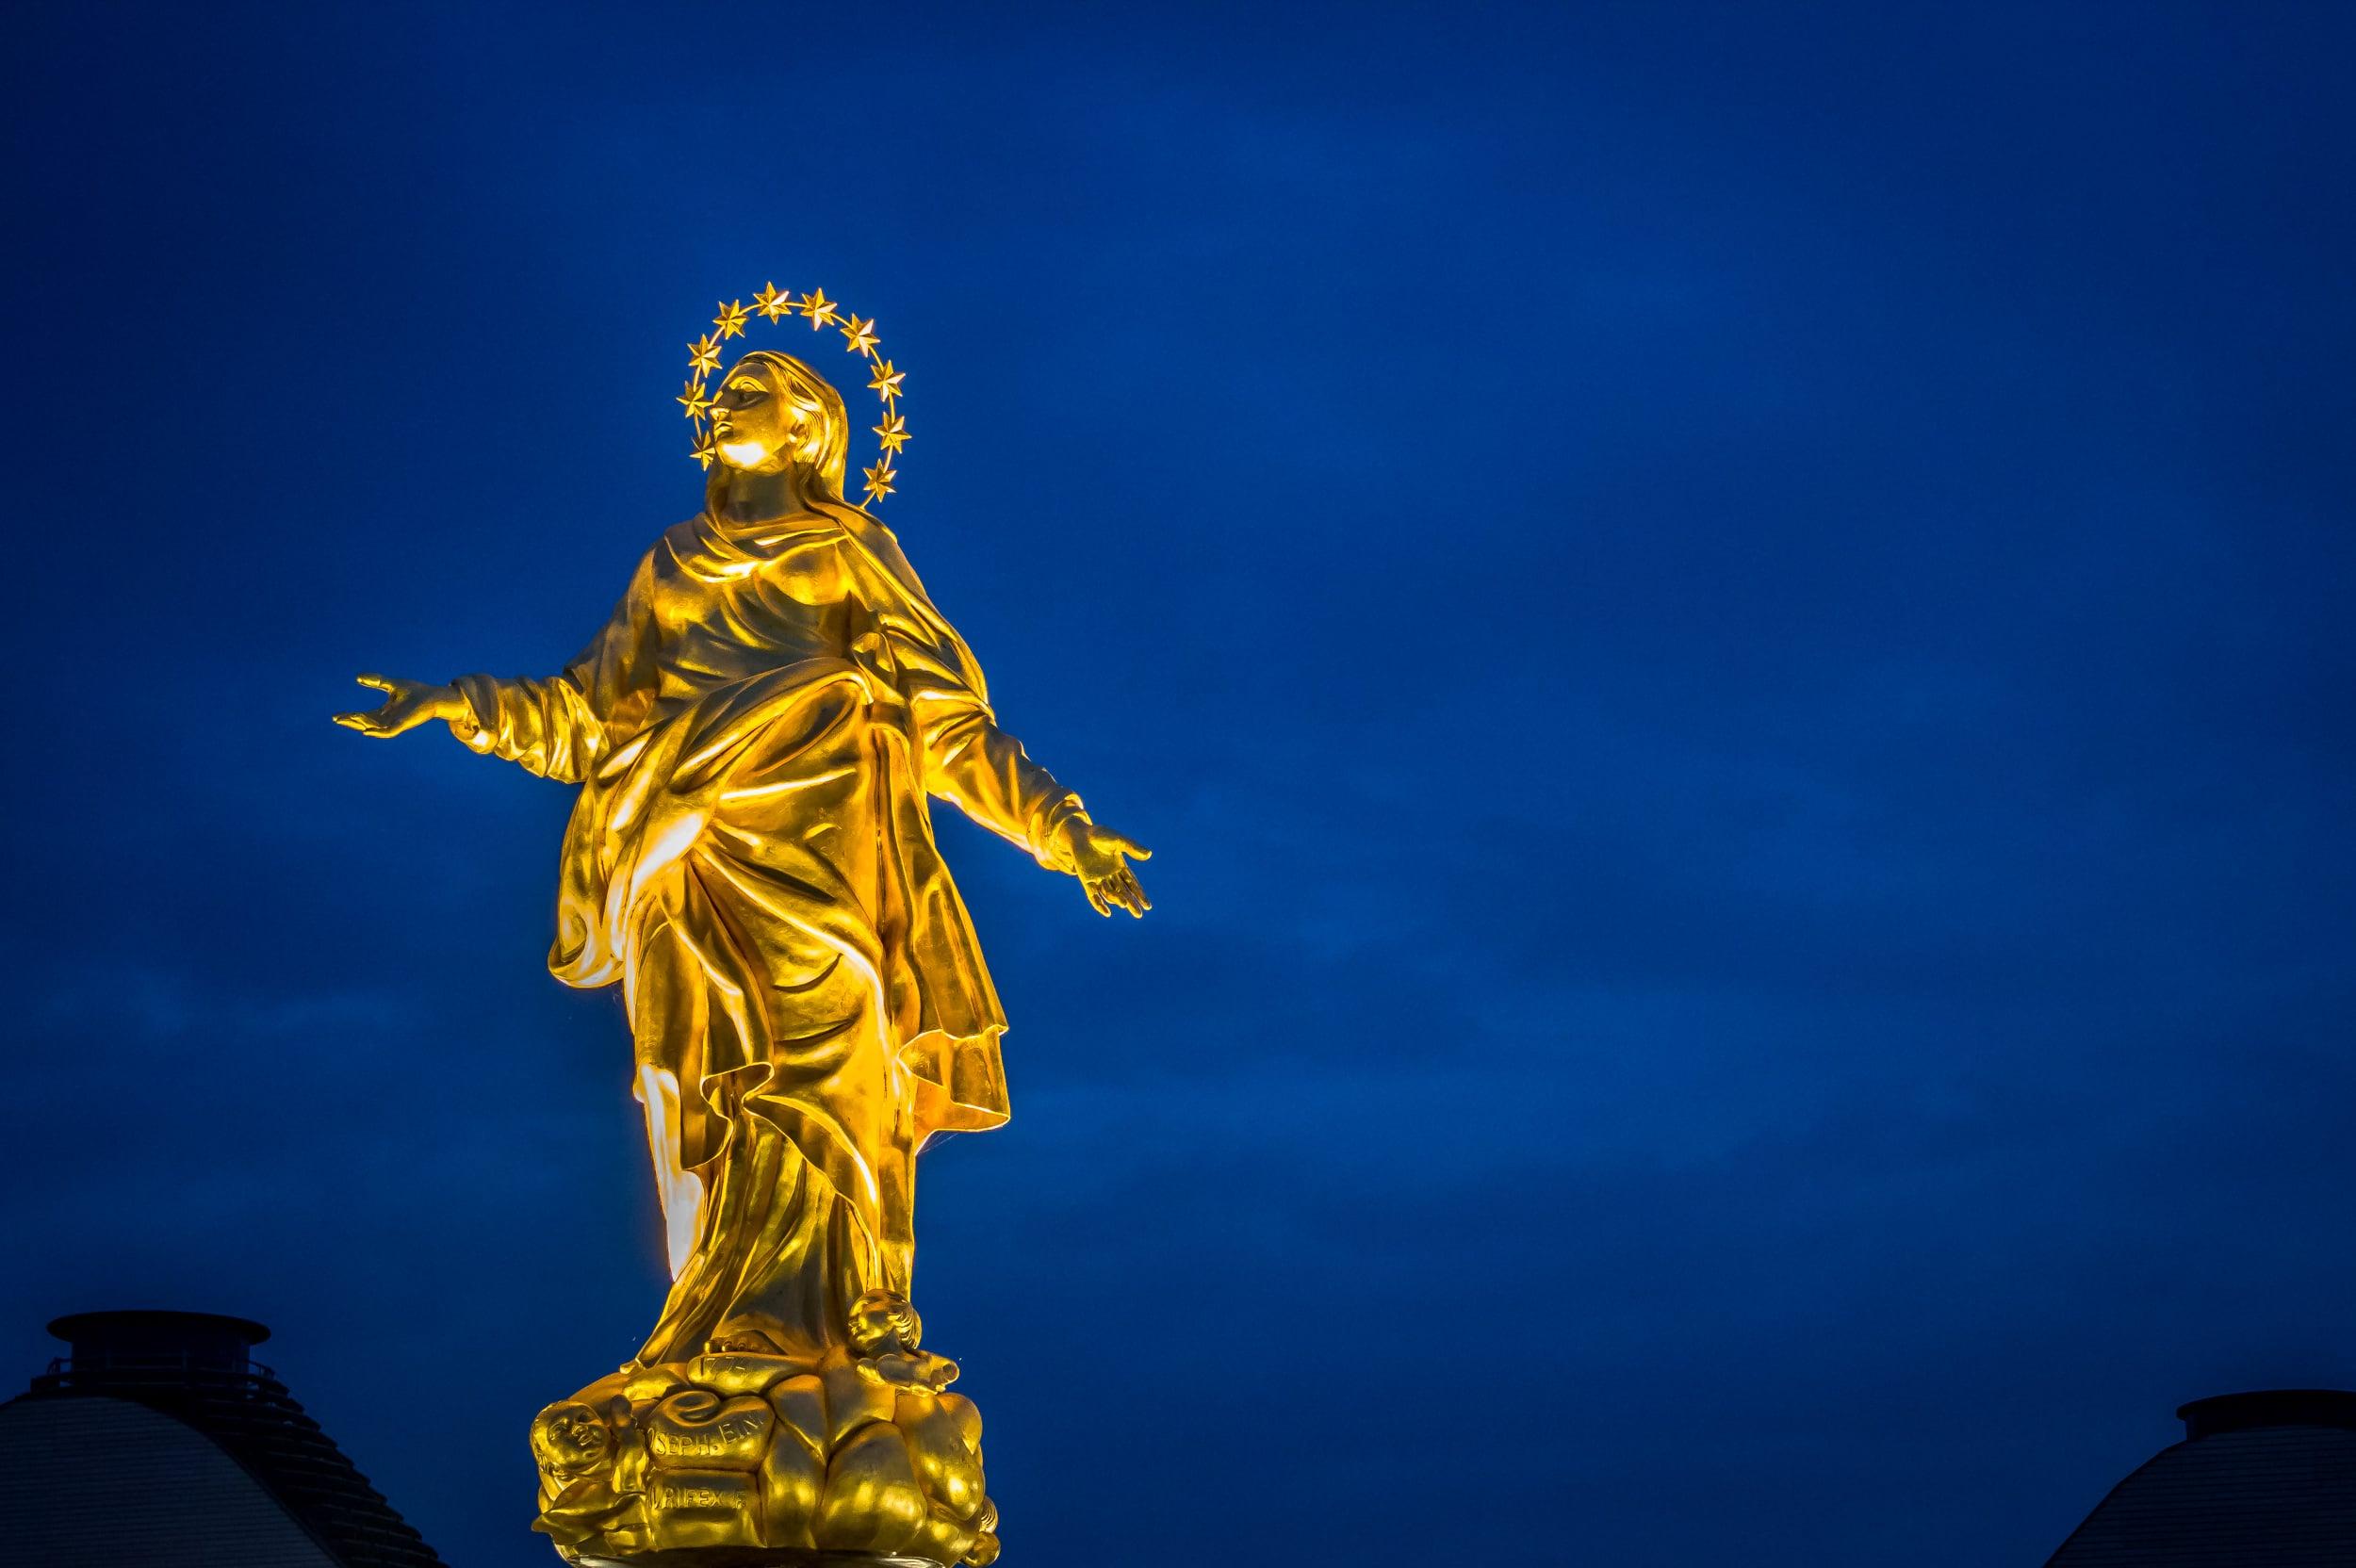 Madonnina del Duomo